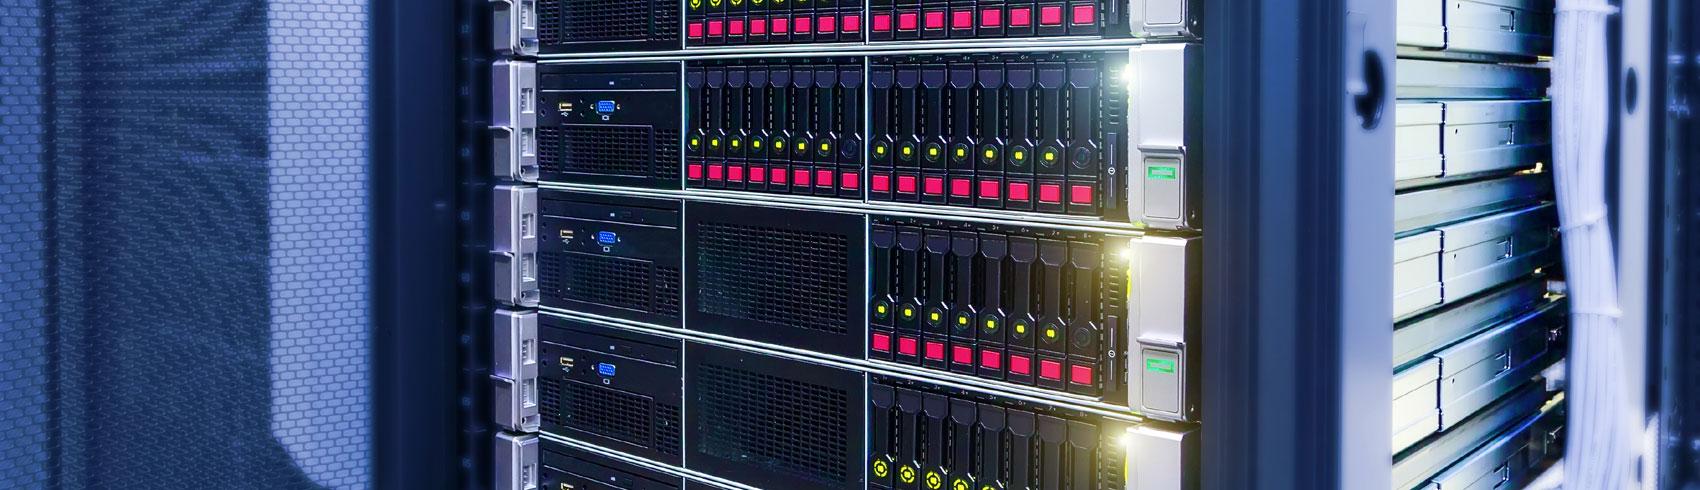 Flagship Technologies | Refurbished Servers, Used Servers, Data